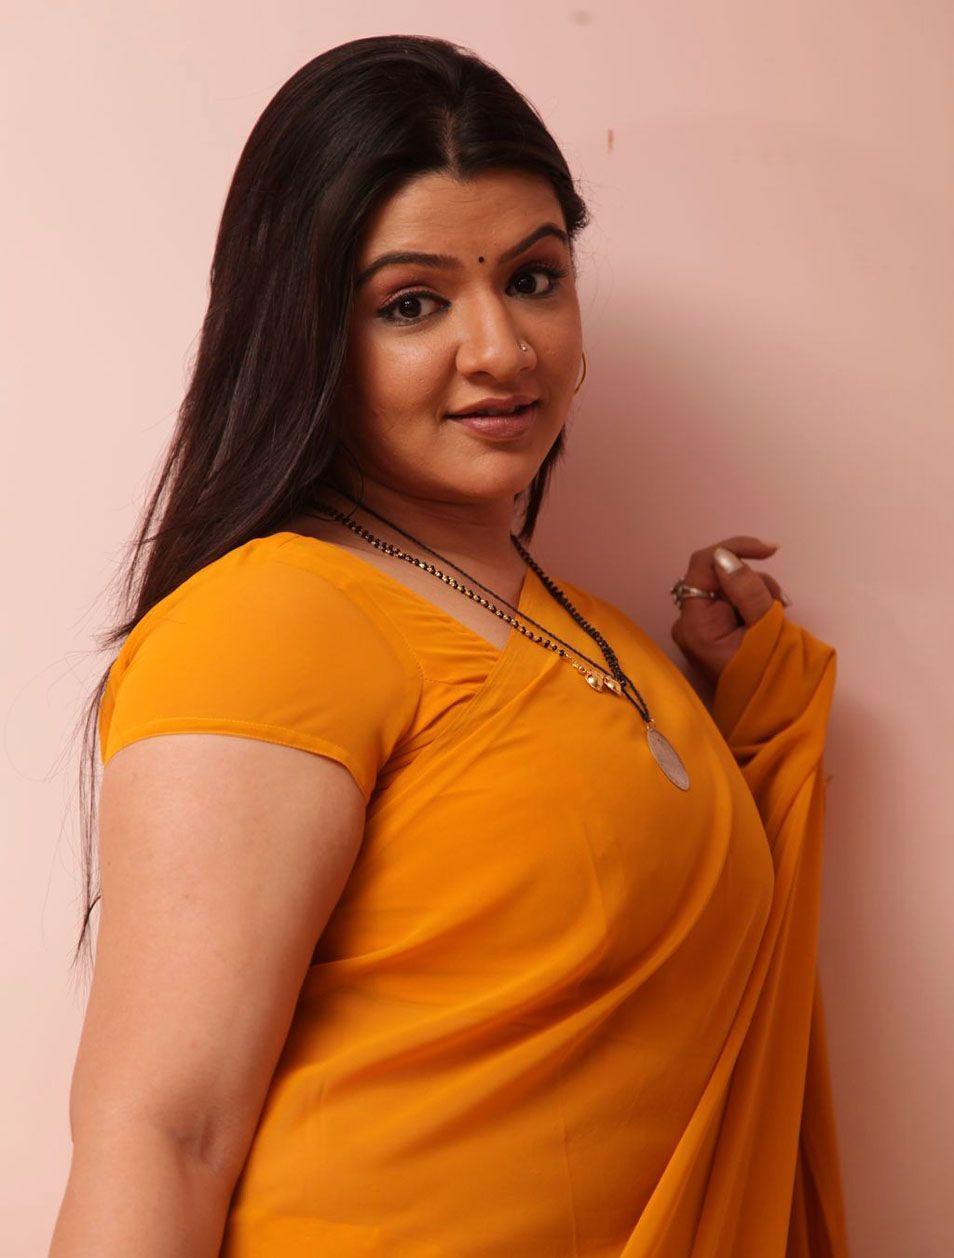 Saree blouse bra photos M: Stretchable Lycra Gold Ready-made Saree Blouse